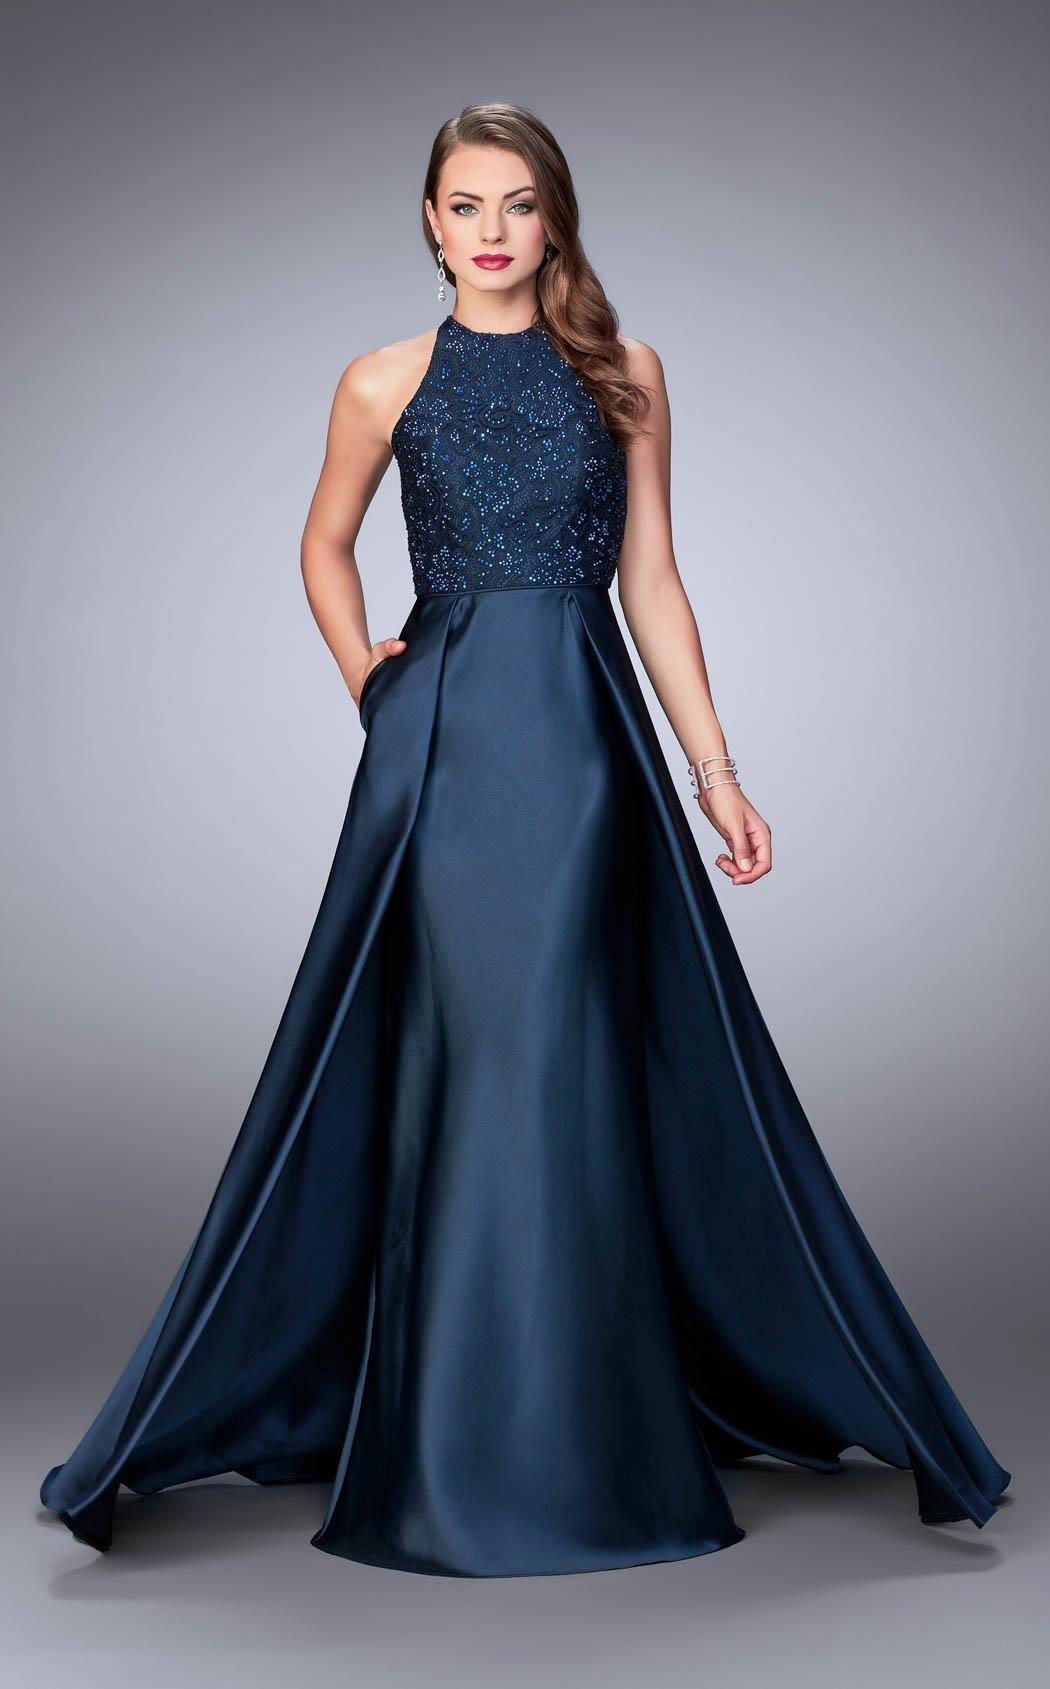 Fashion week Bridal powder a evening dress boutique for woman